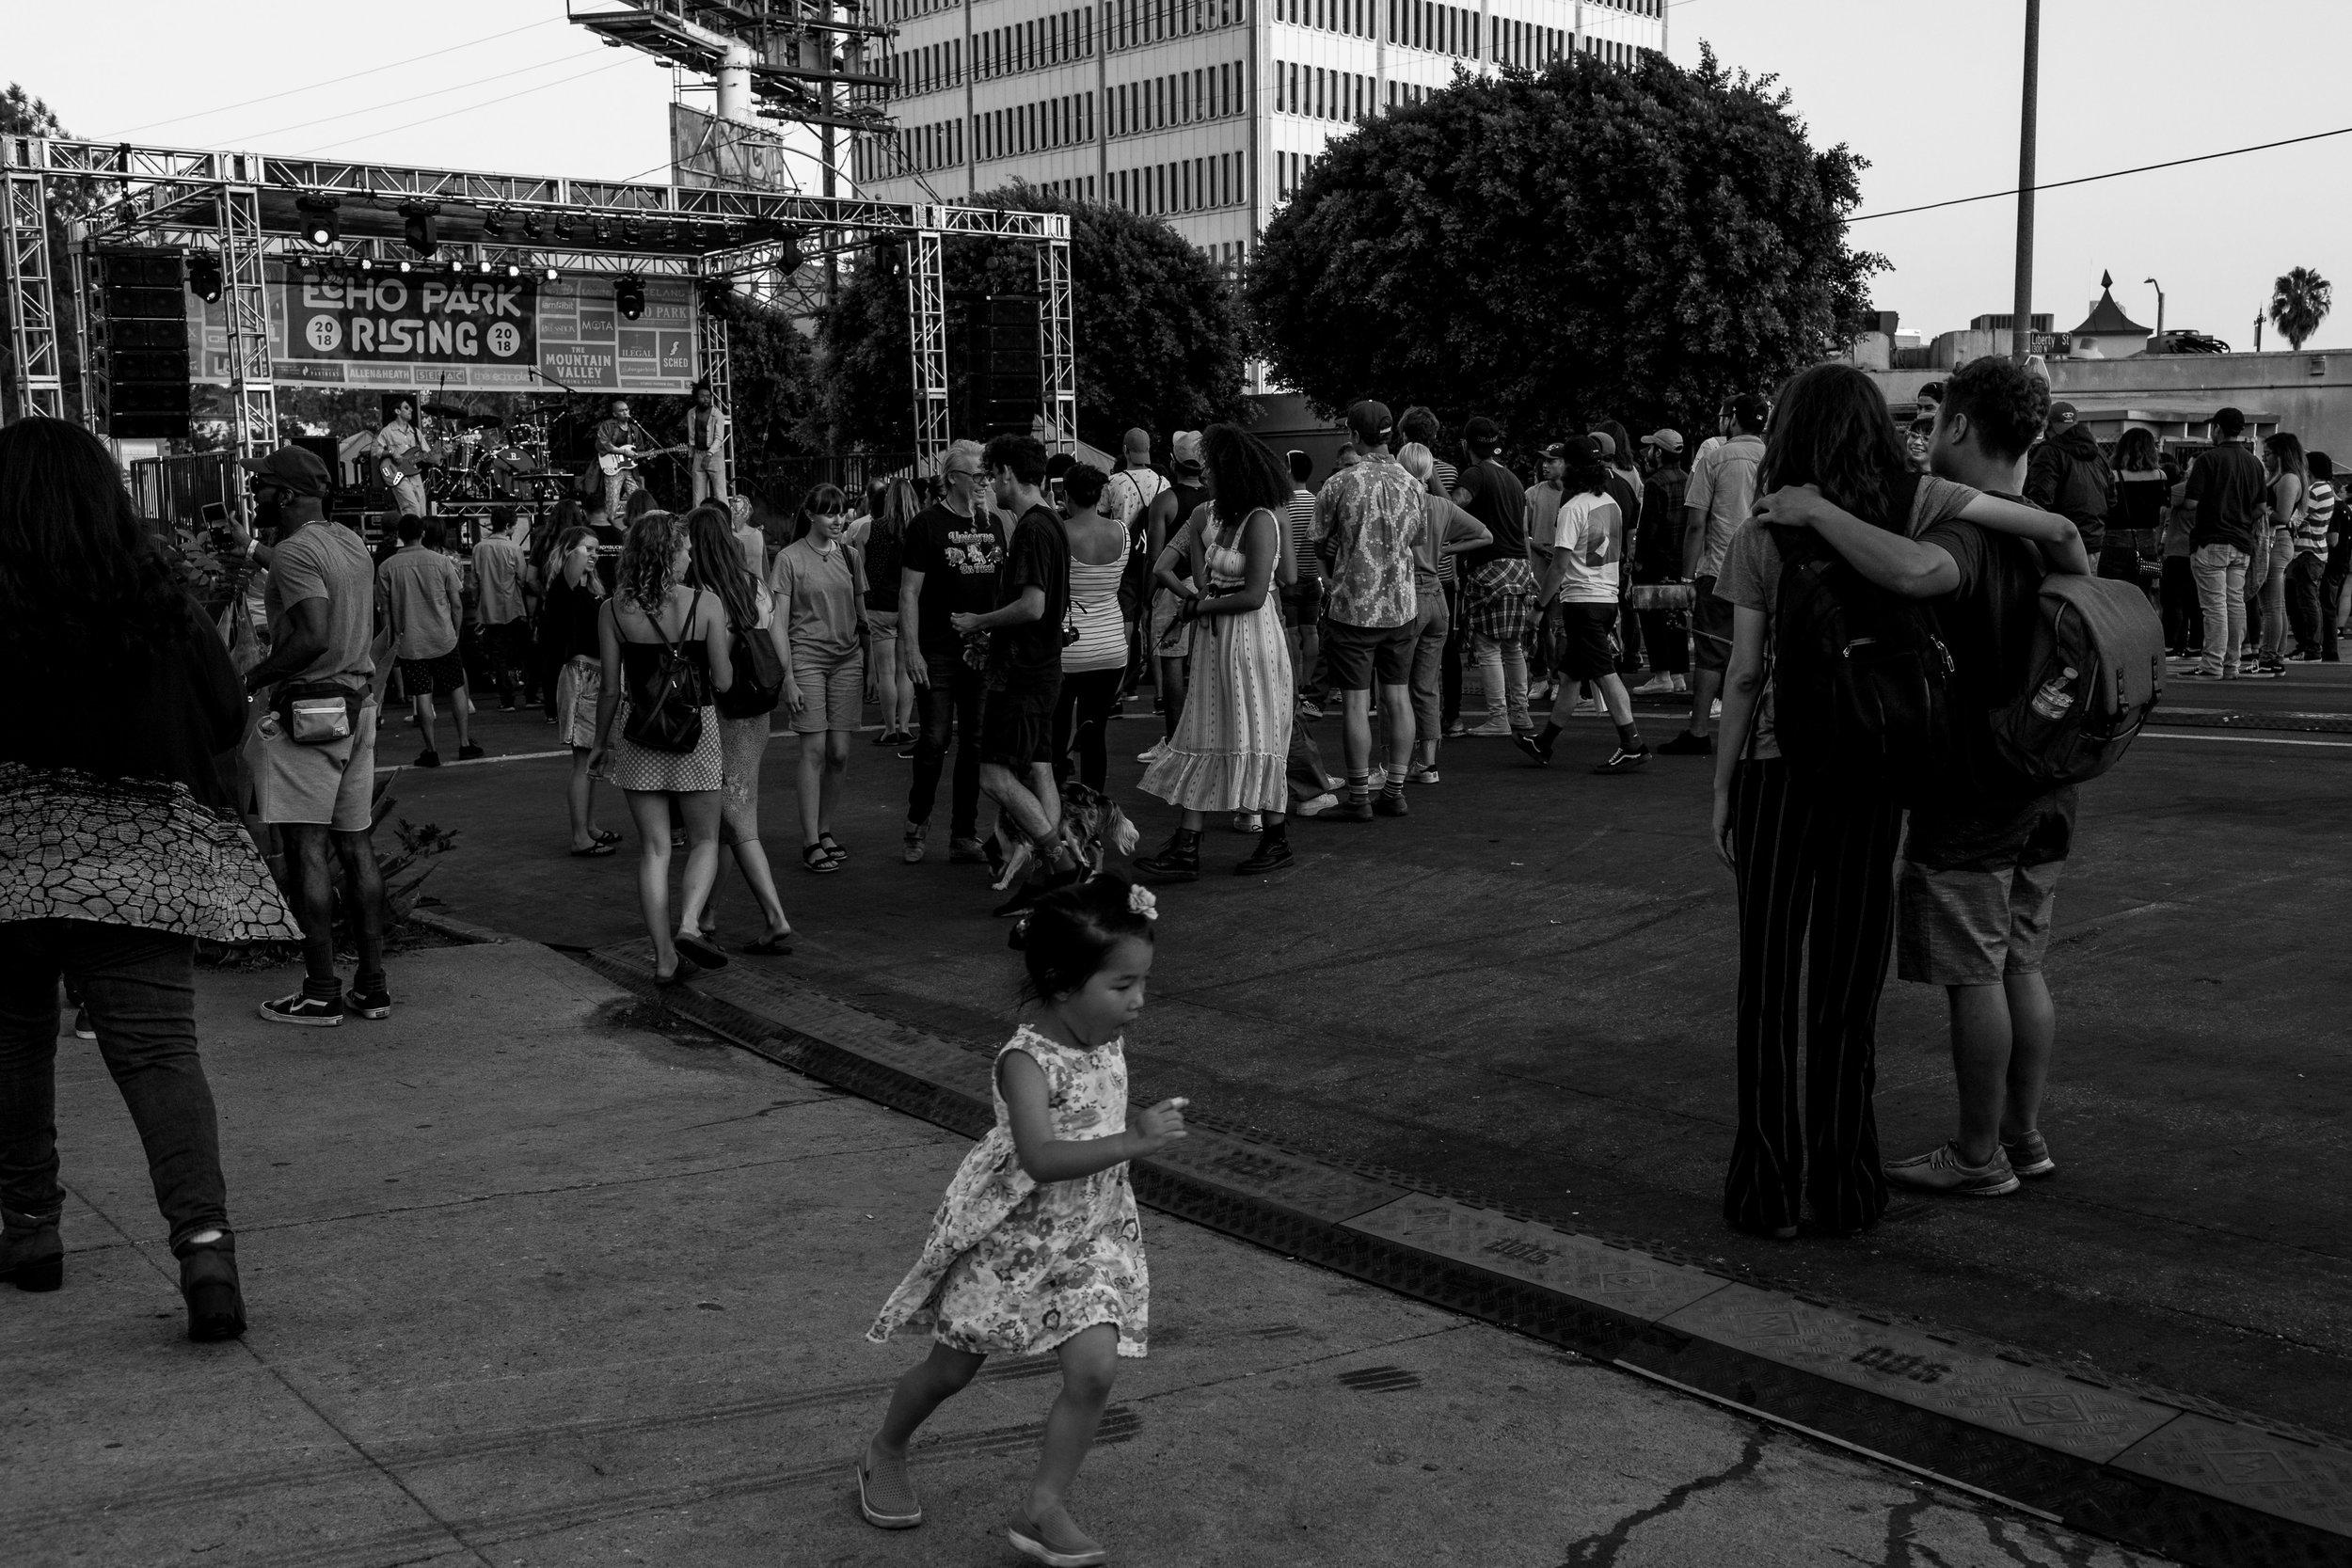 Echo Park Rising-9.jpg